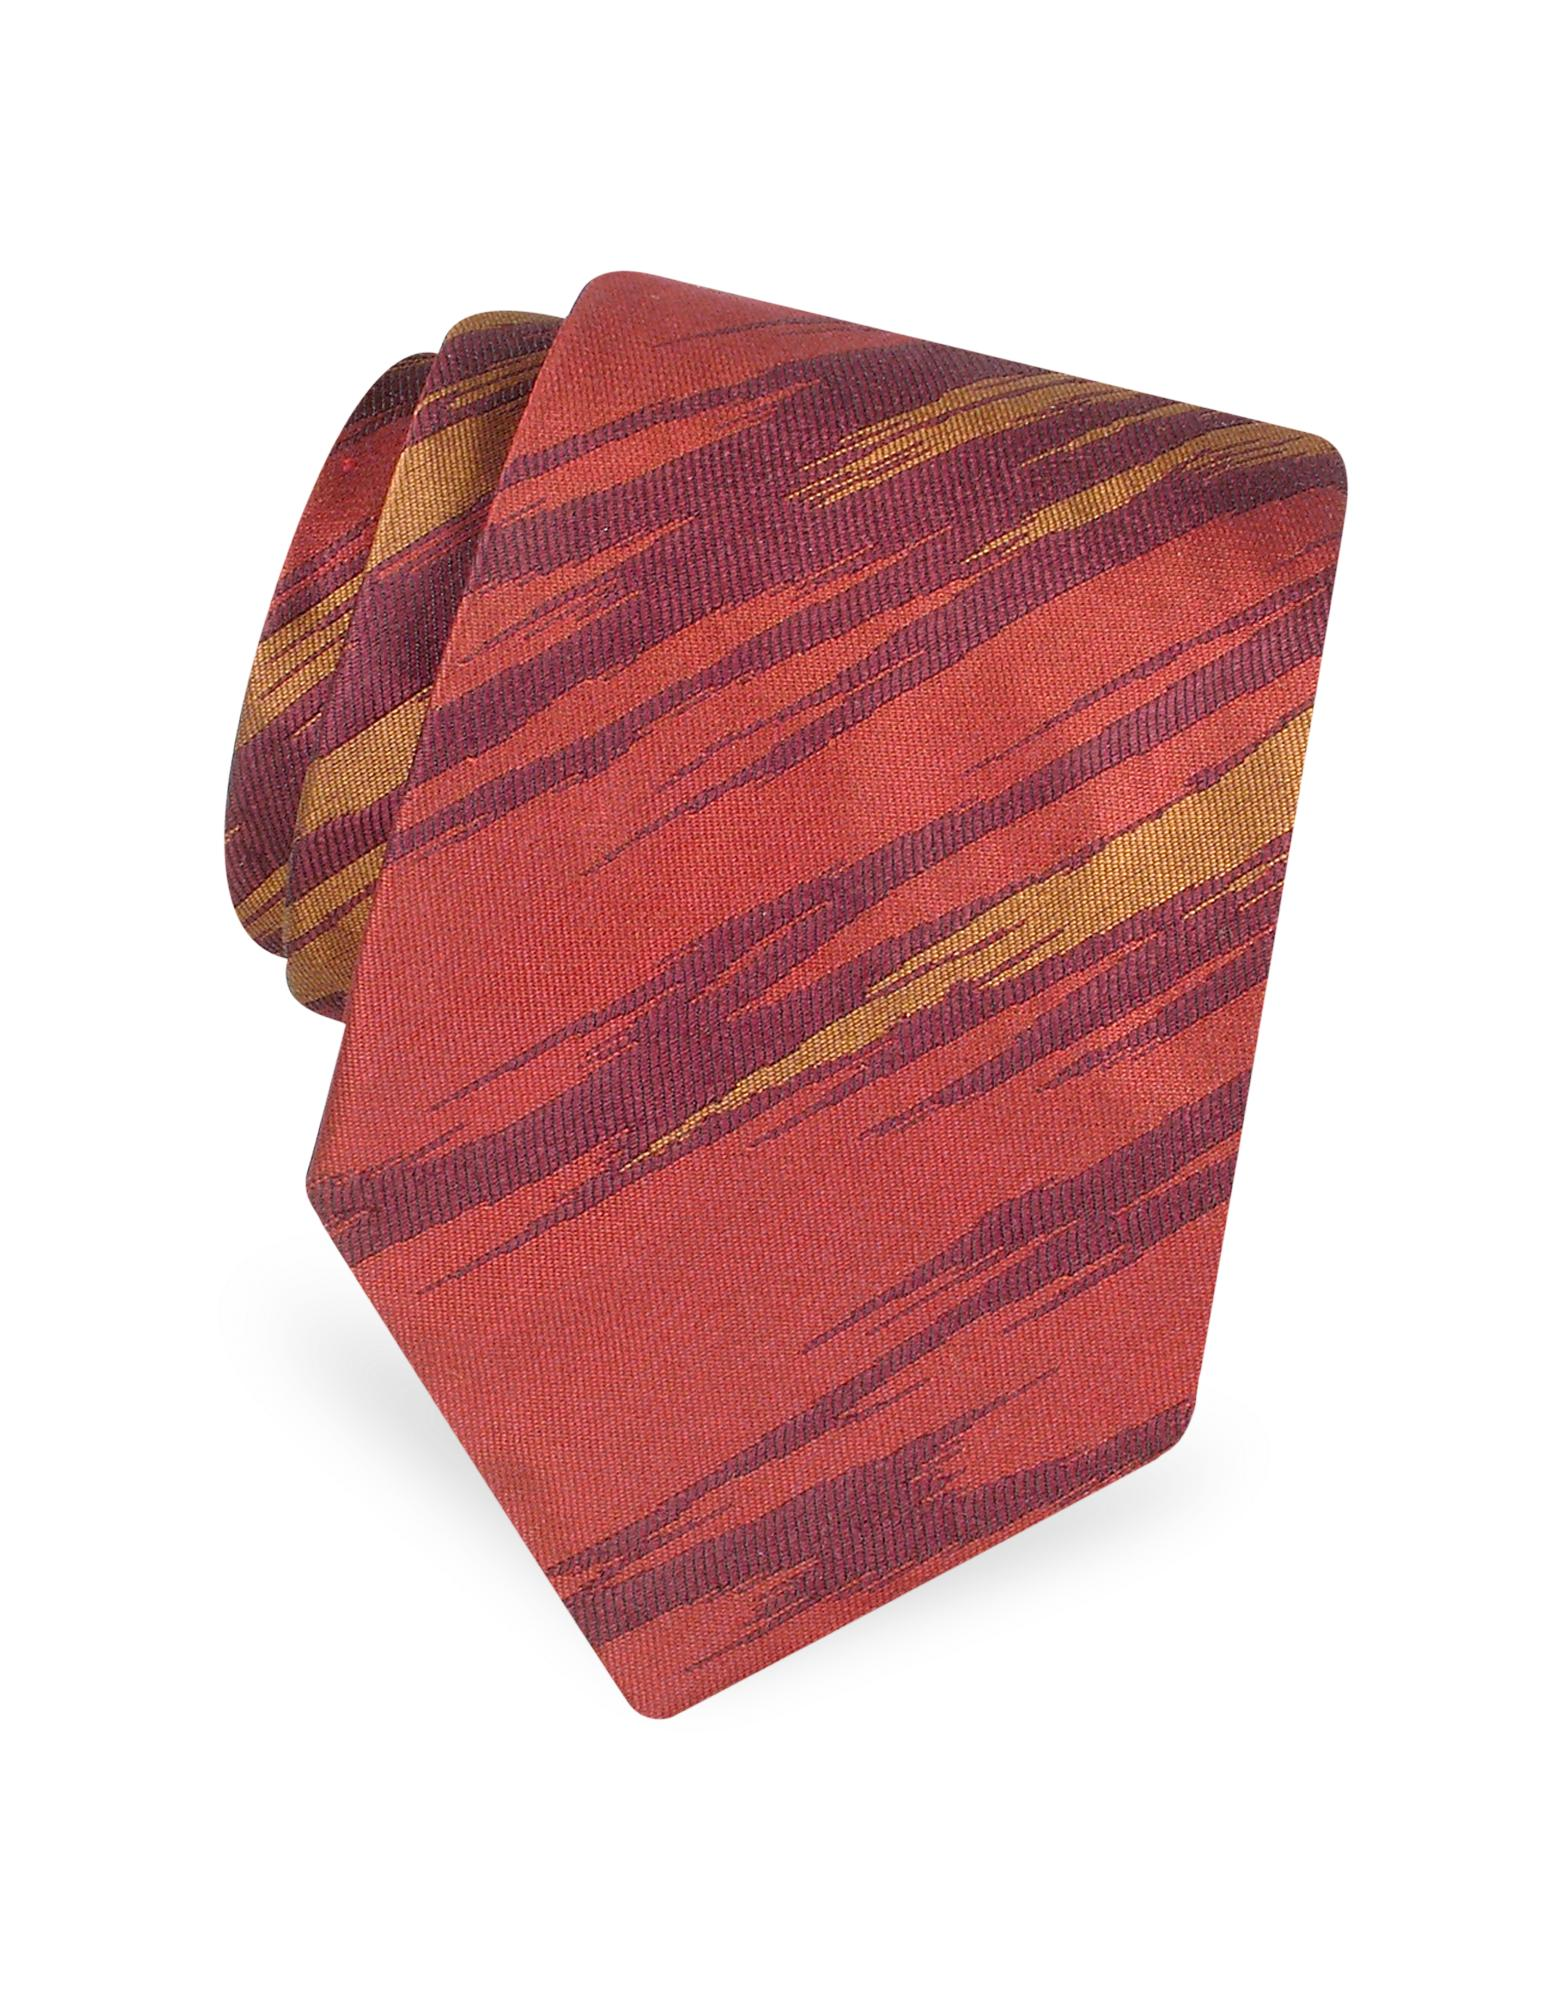 Gokan Kobo Touch  Shimmering Patterned Woven Silk Tie